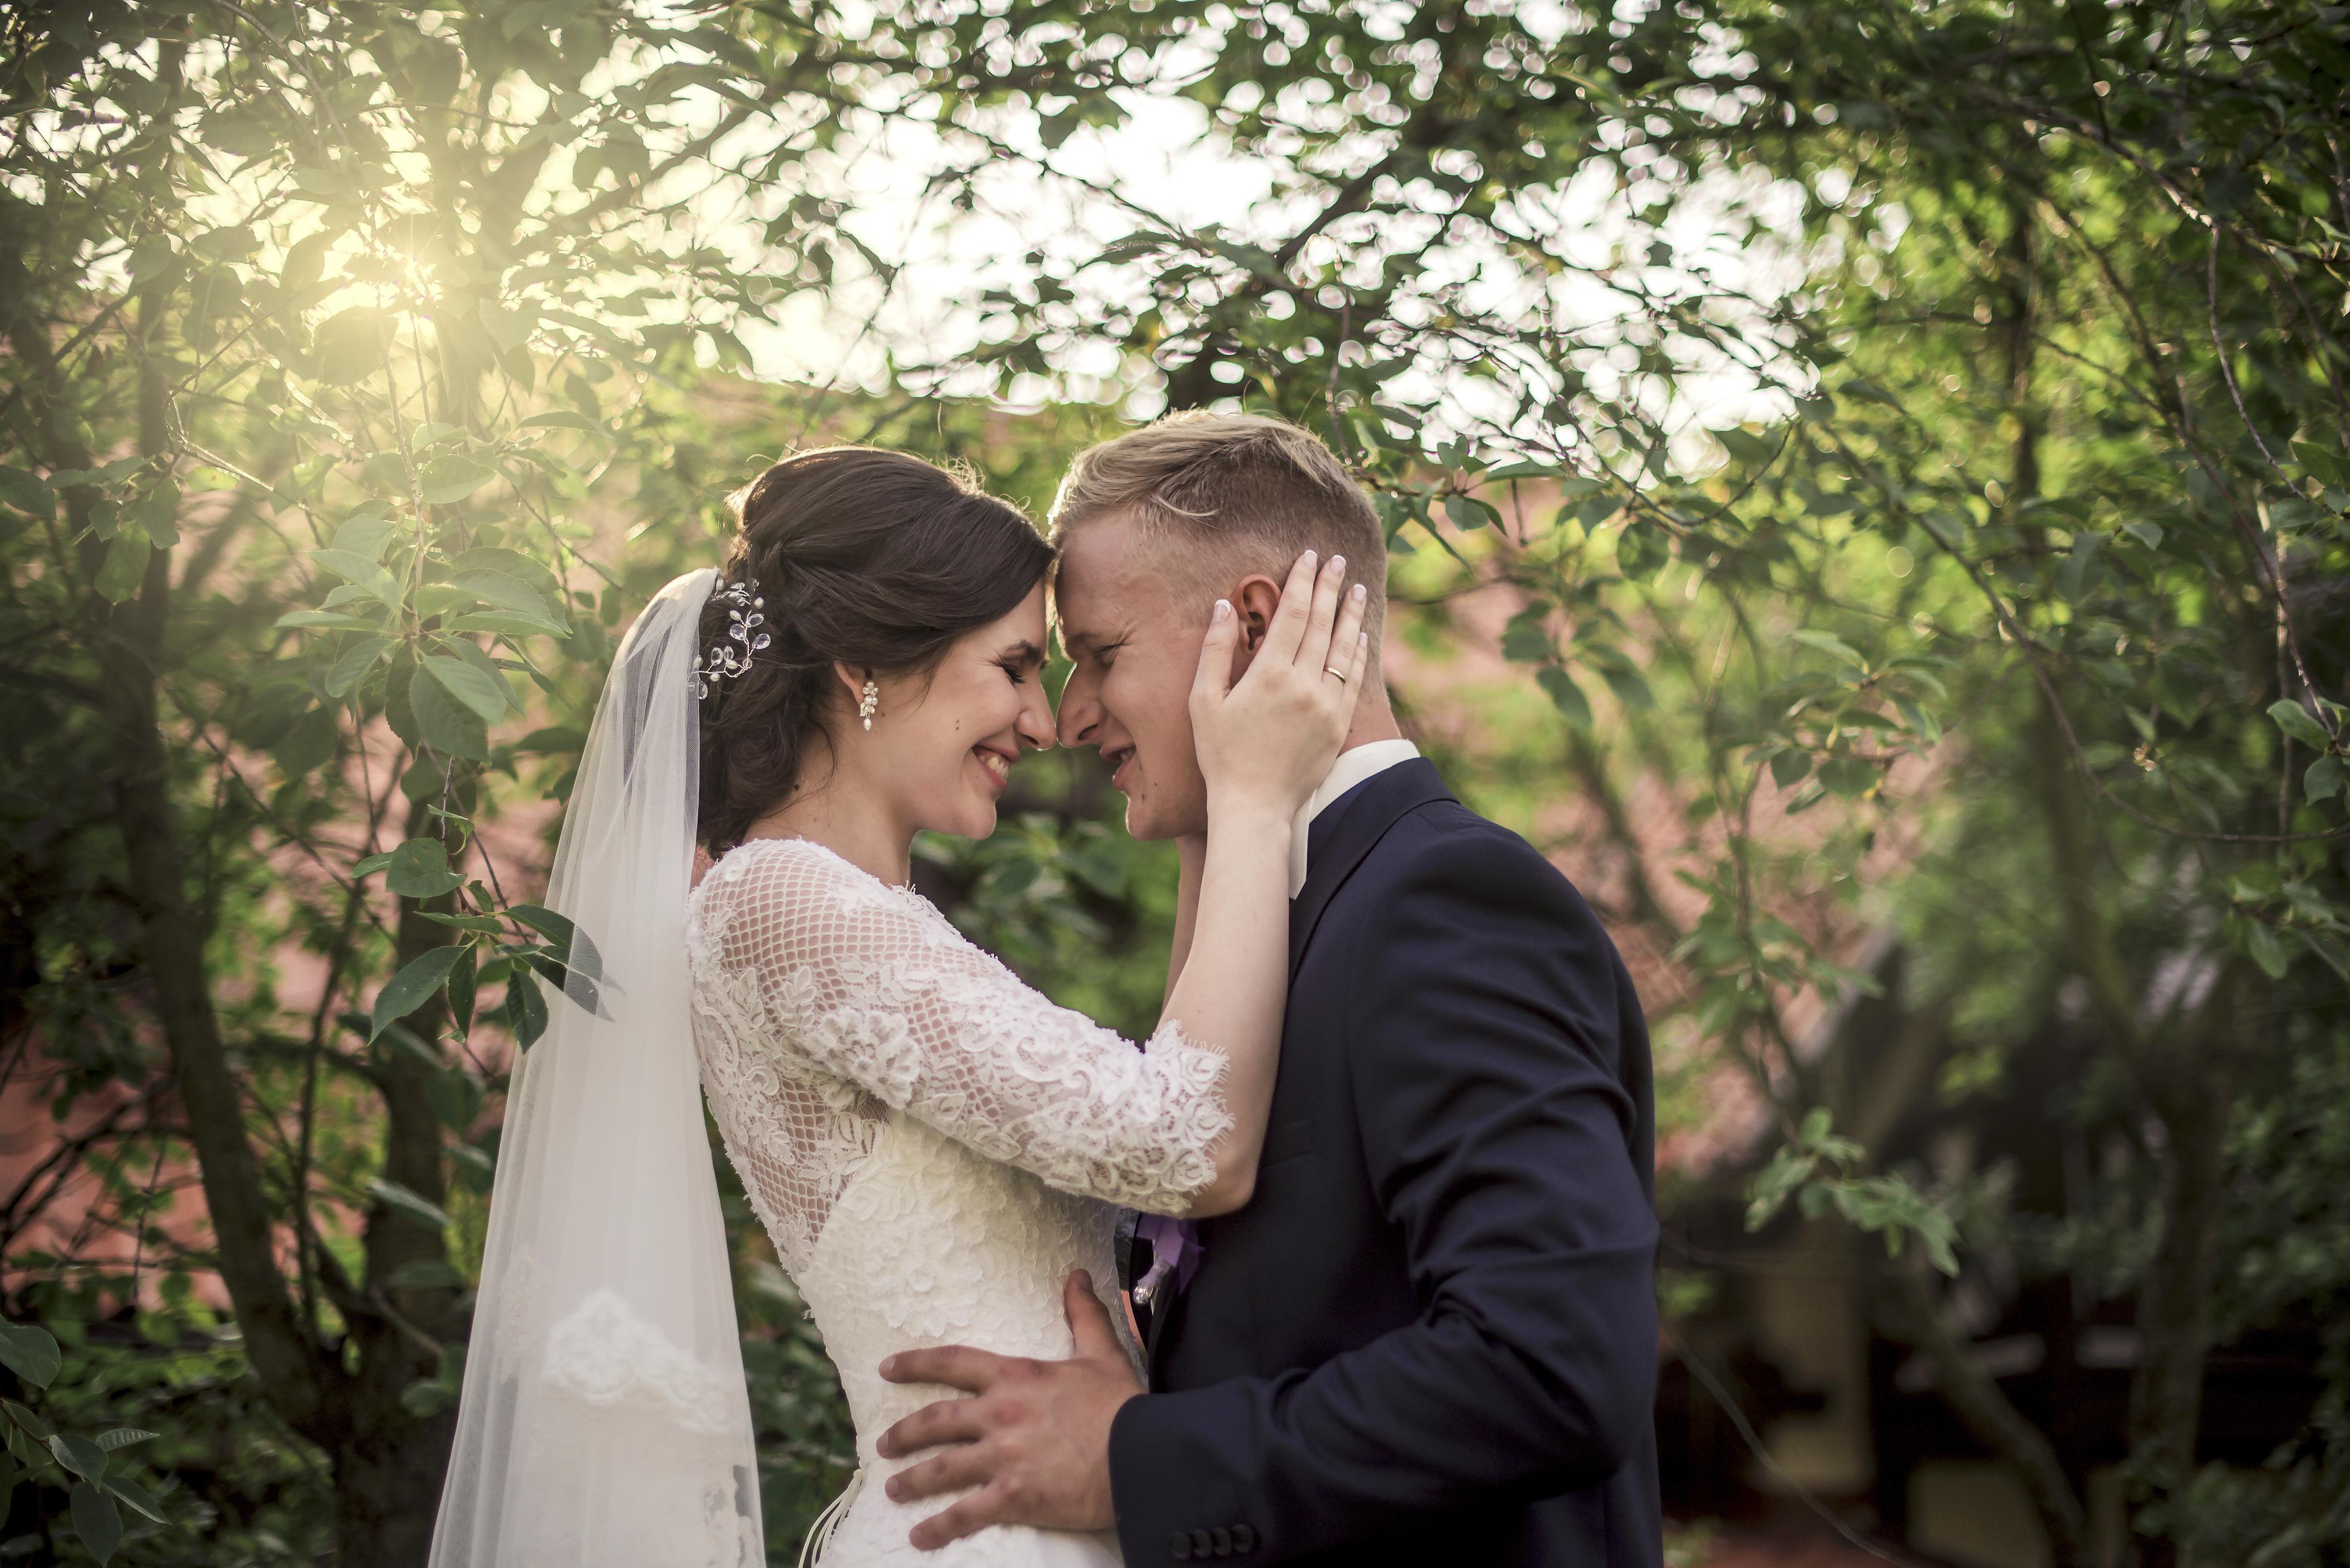 https://sleeklens.com/wp-content/uploads/2018/09/wedding-lightroom-presets-signature-bride-groom-before-5.jpg